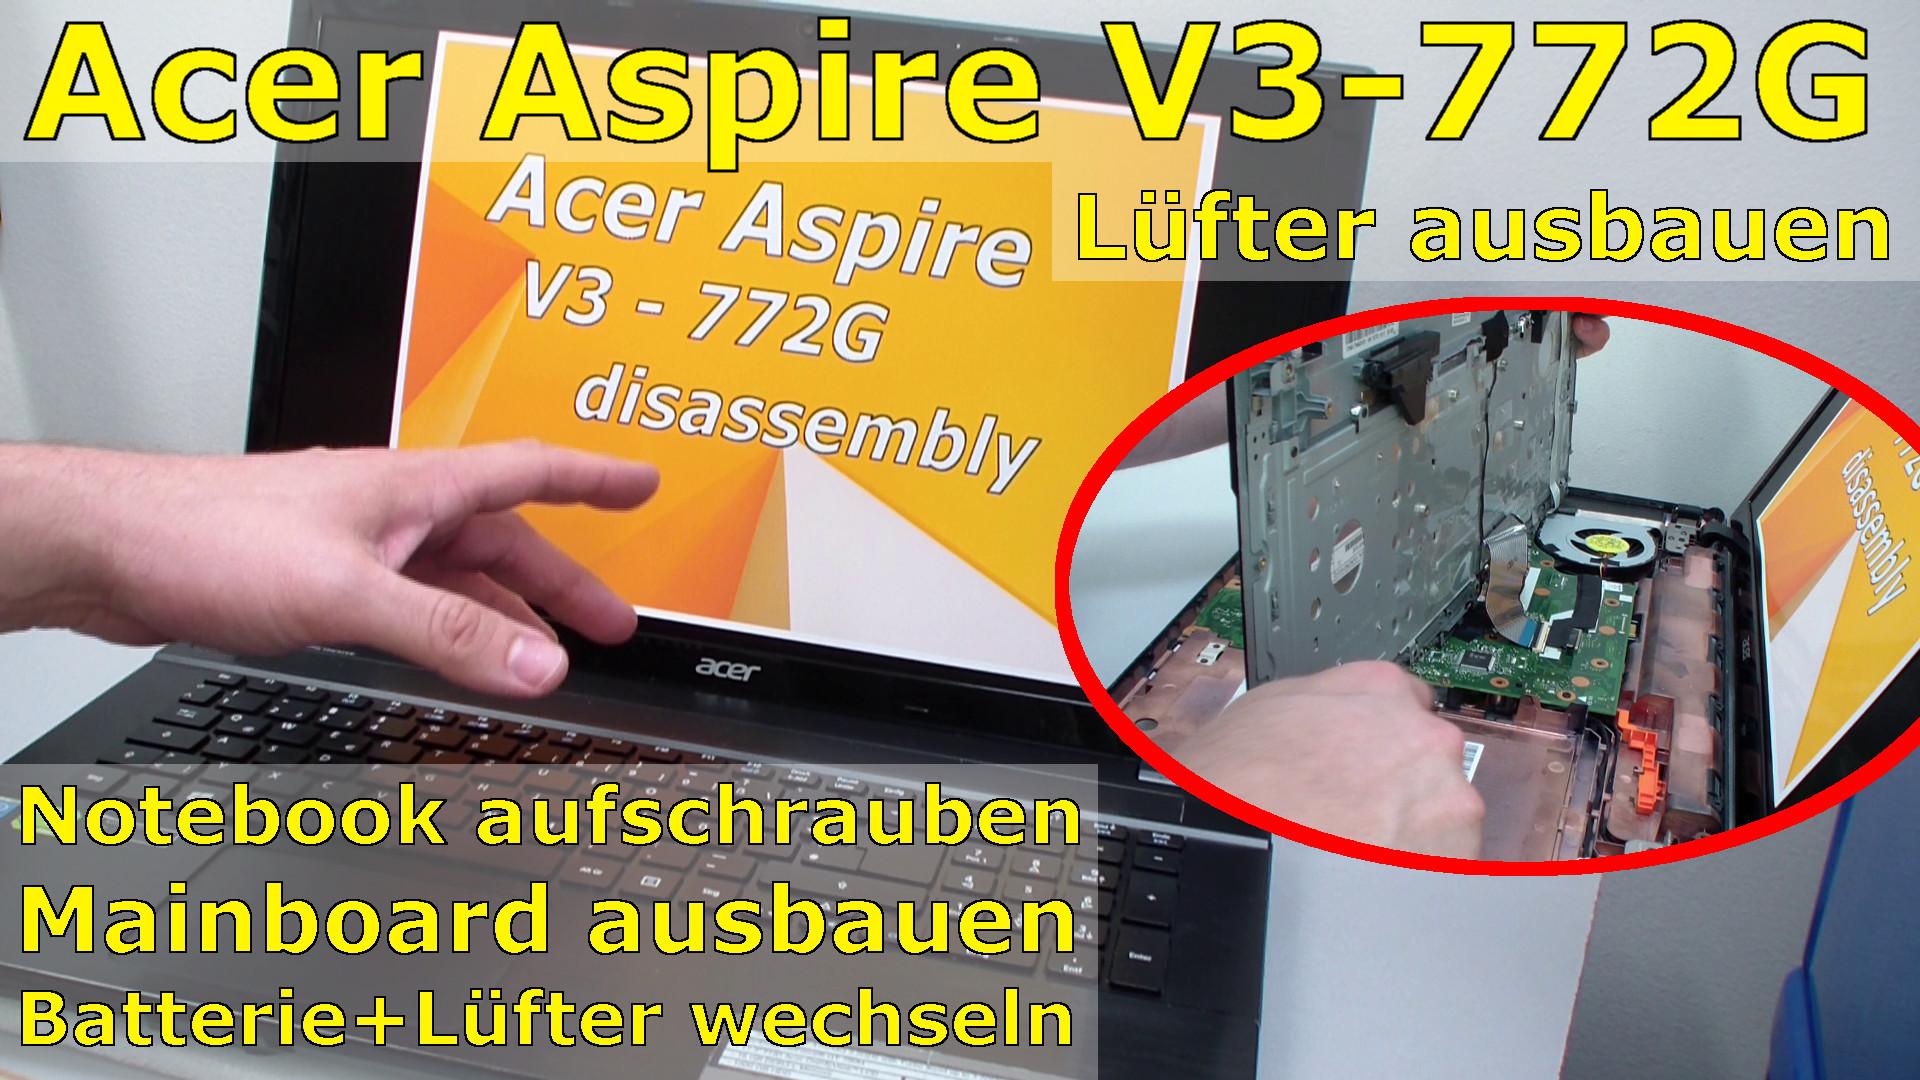 acer aspire v3 772g ffnen und reparieren fan replacing l fter ersetzen tuhl teim de. Black Bedroom Furniture Sets. Home Design Ideas